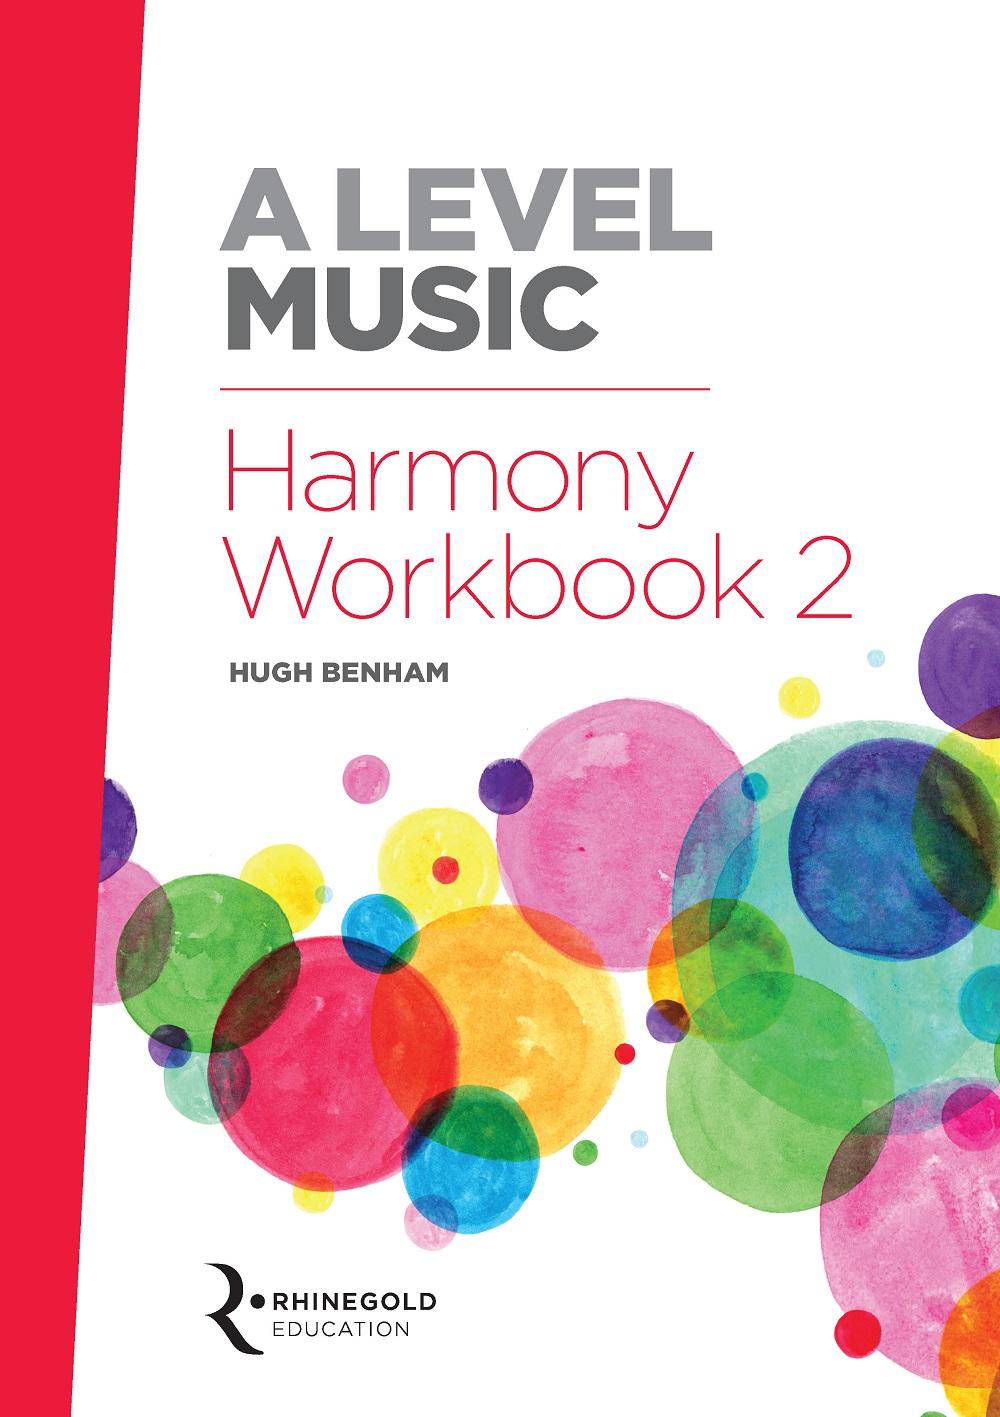 Hugh Benham: A Level Music Harmony Workbook 2: Teaching Resource